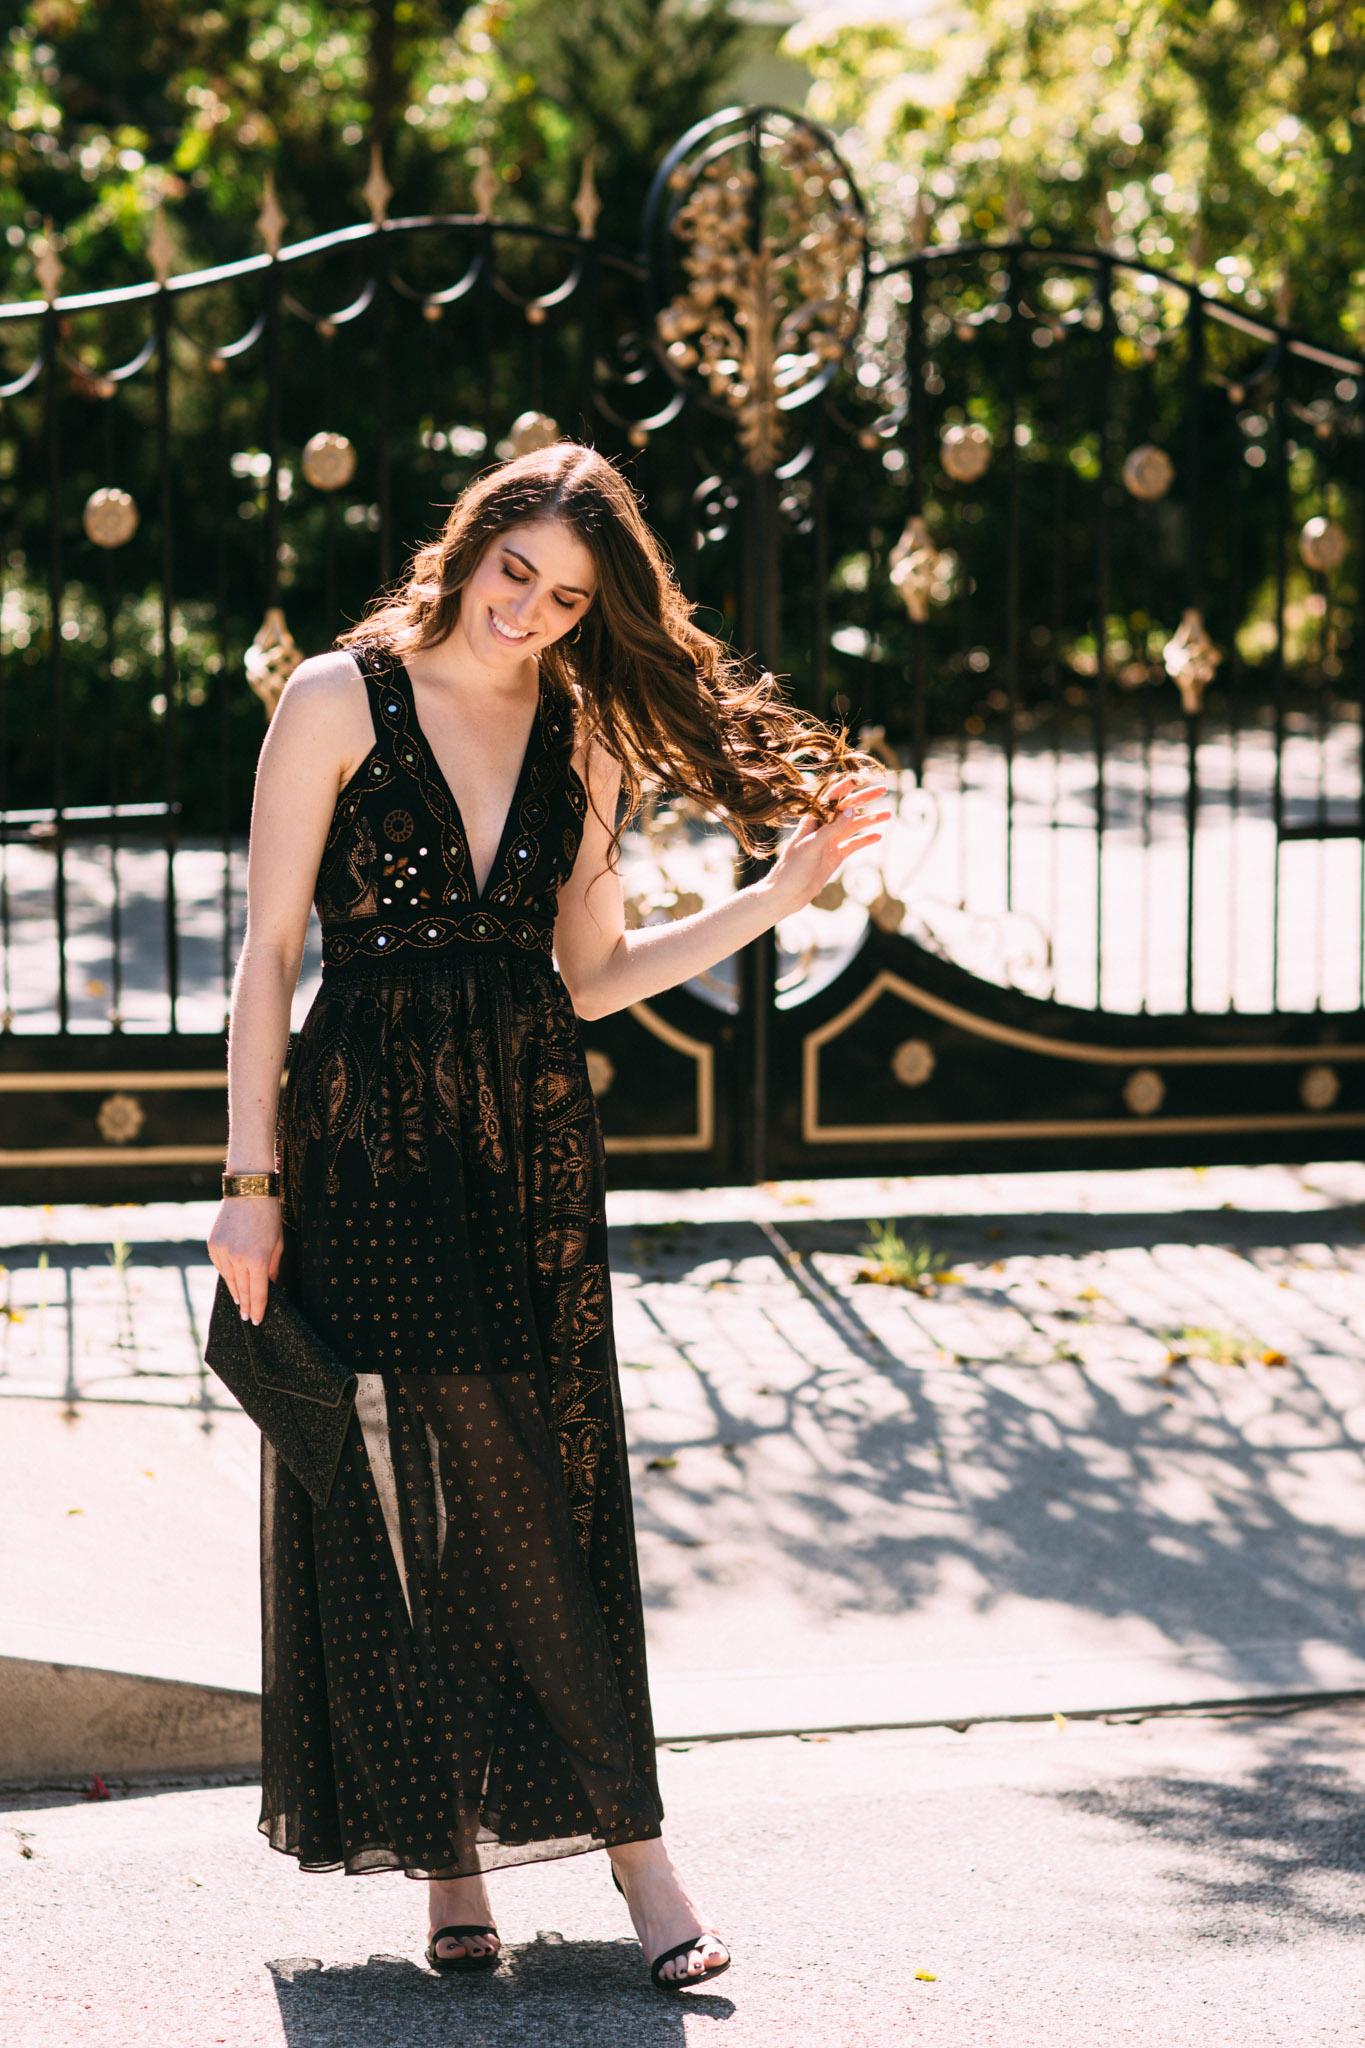 Moroccan inspired black dress